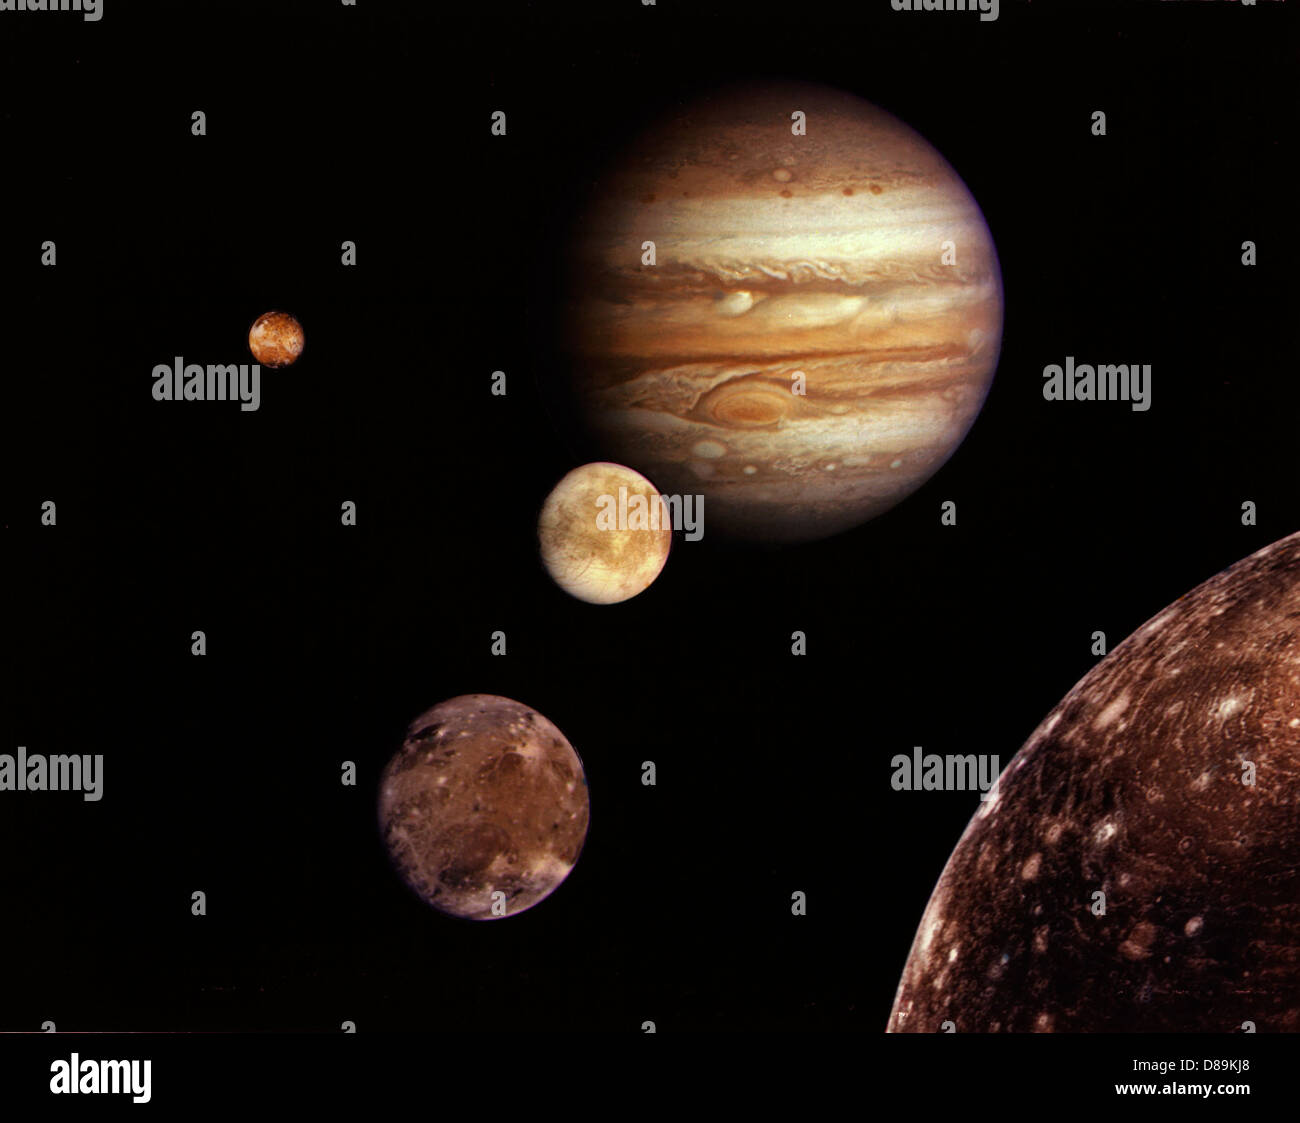 Jupiter And Its Moons - Stock Image